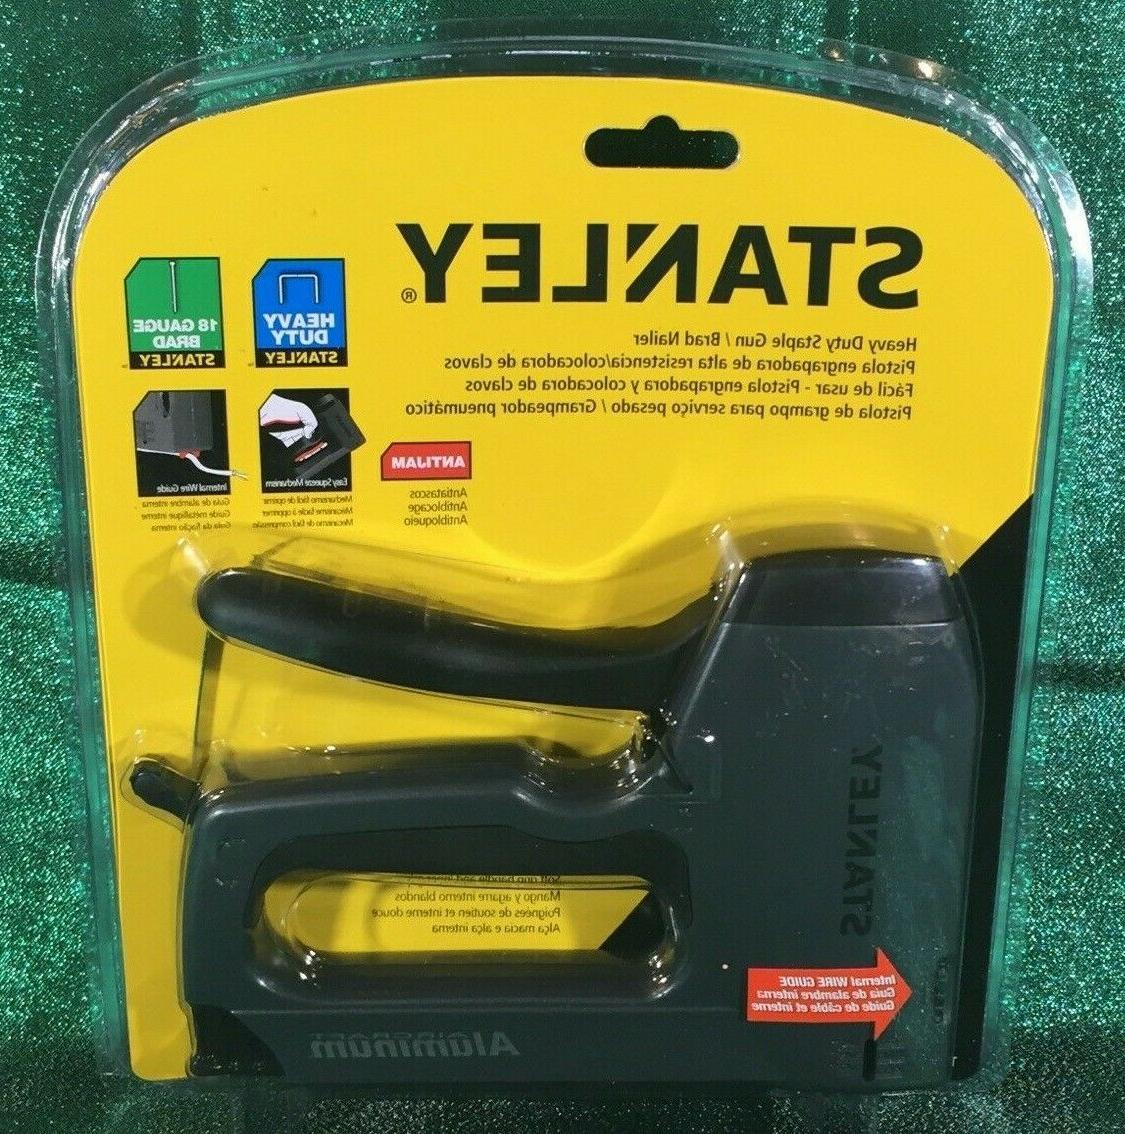 tr250 staple nail gun manual hvy duty